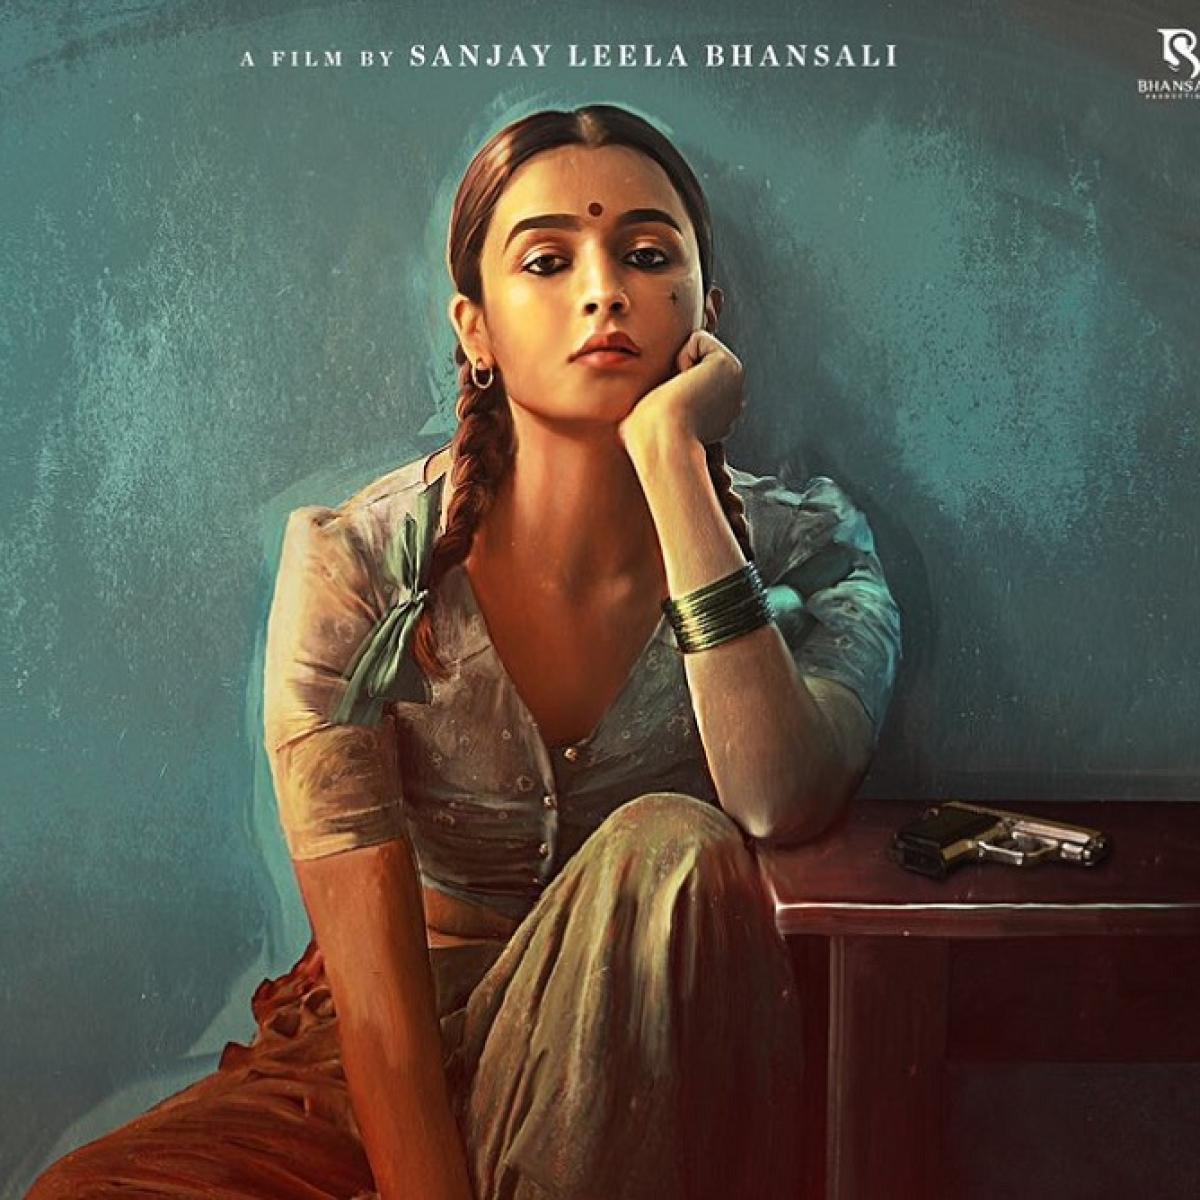 Big Reveal! Sanjay Leela Bhansali to unveil the teaser of his much-awaited 'Gangubai Kathiawadi' today?